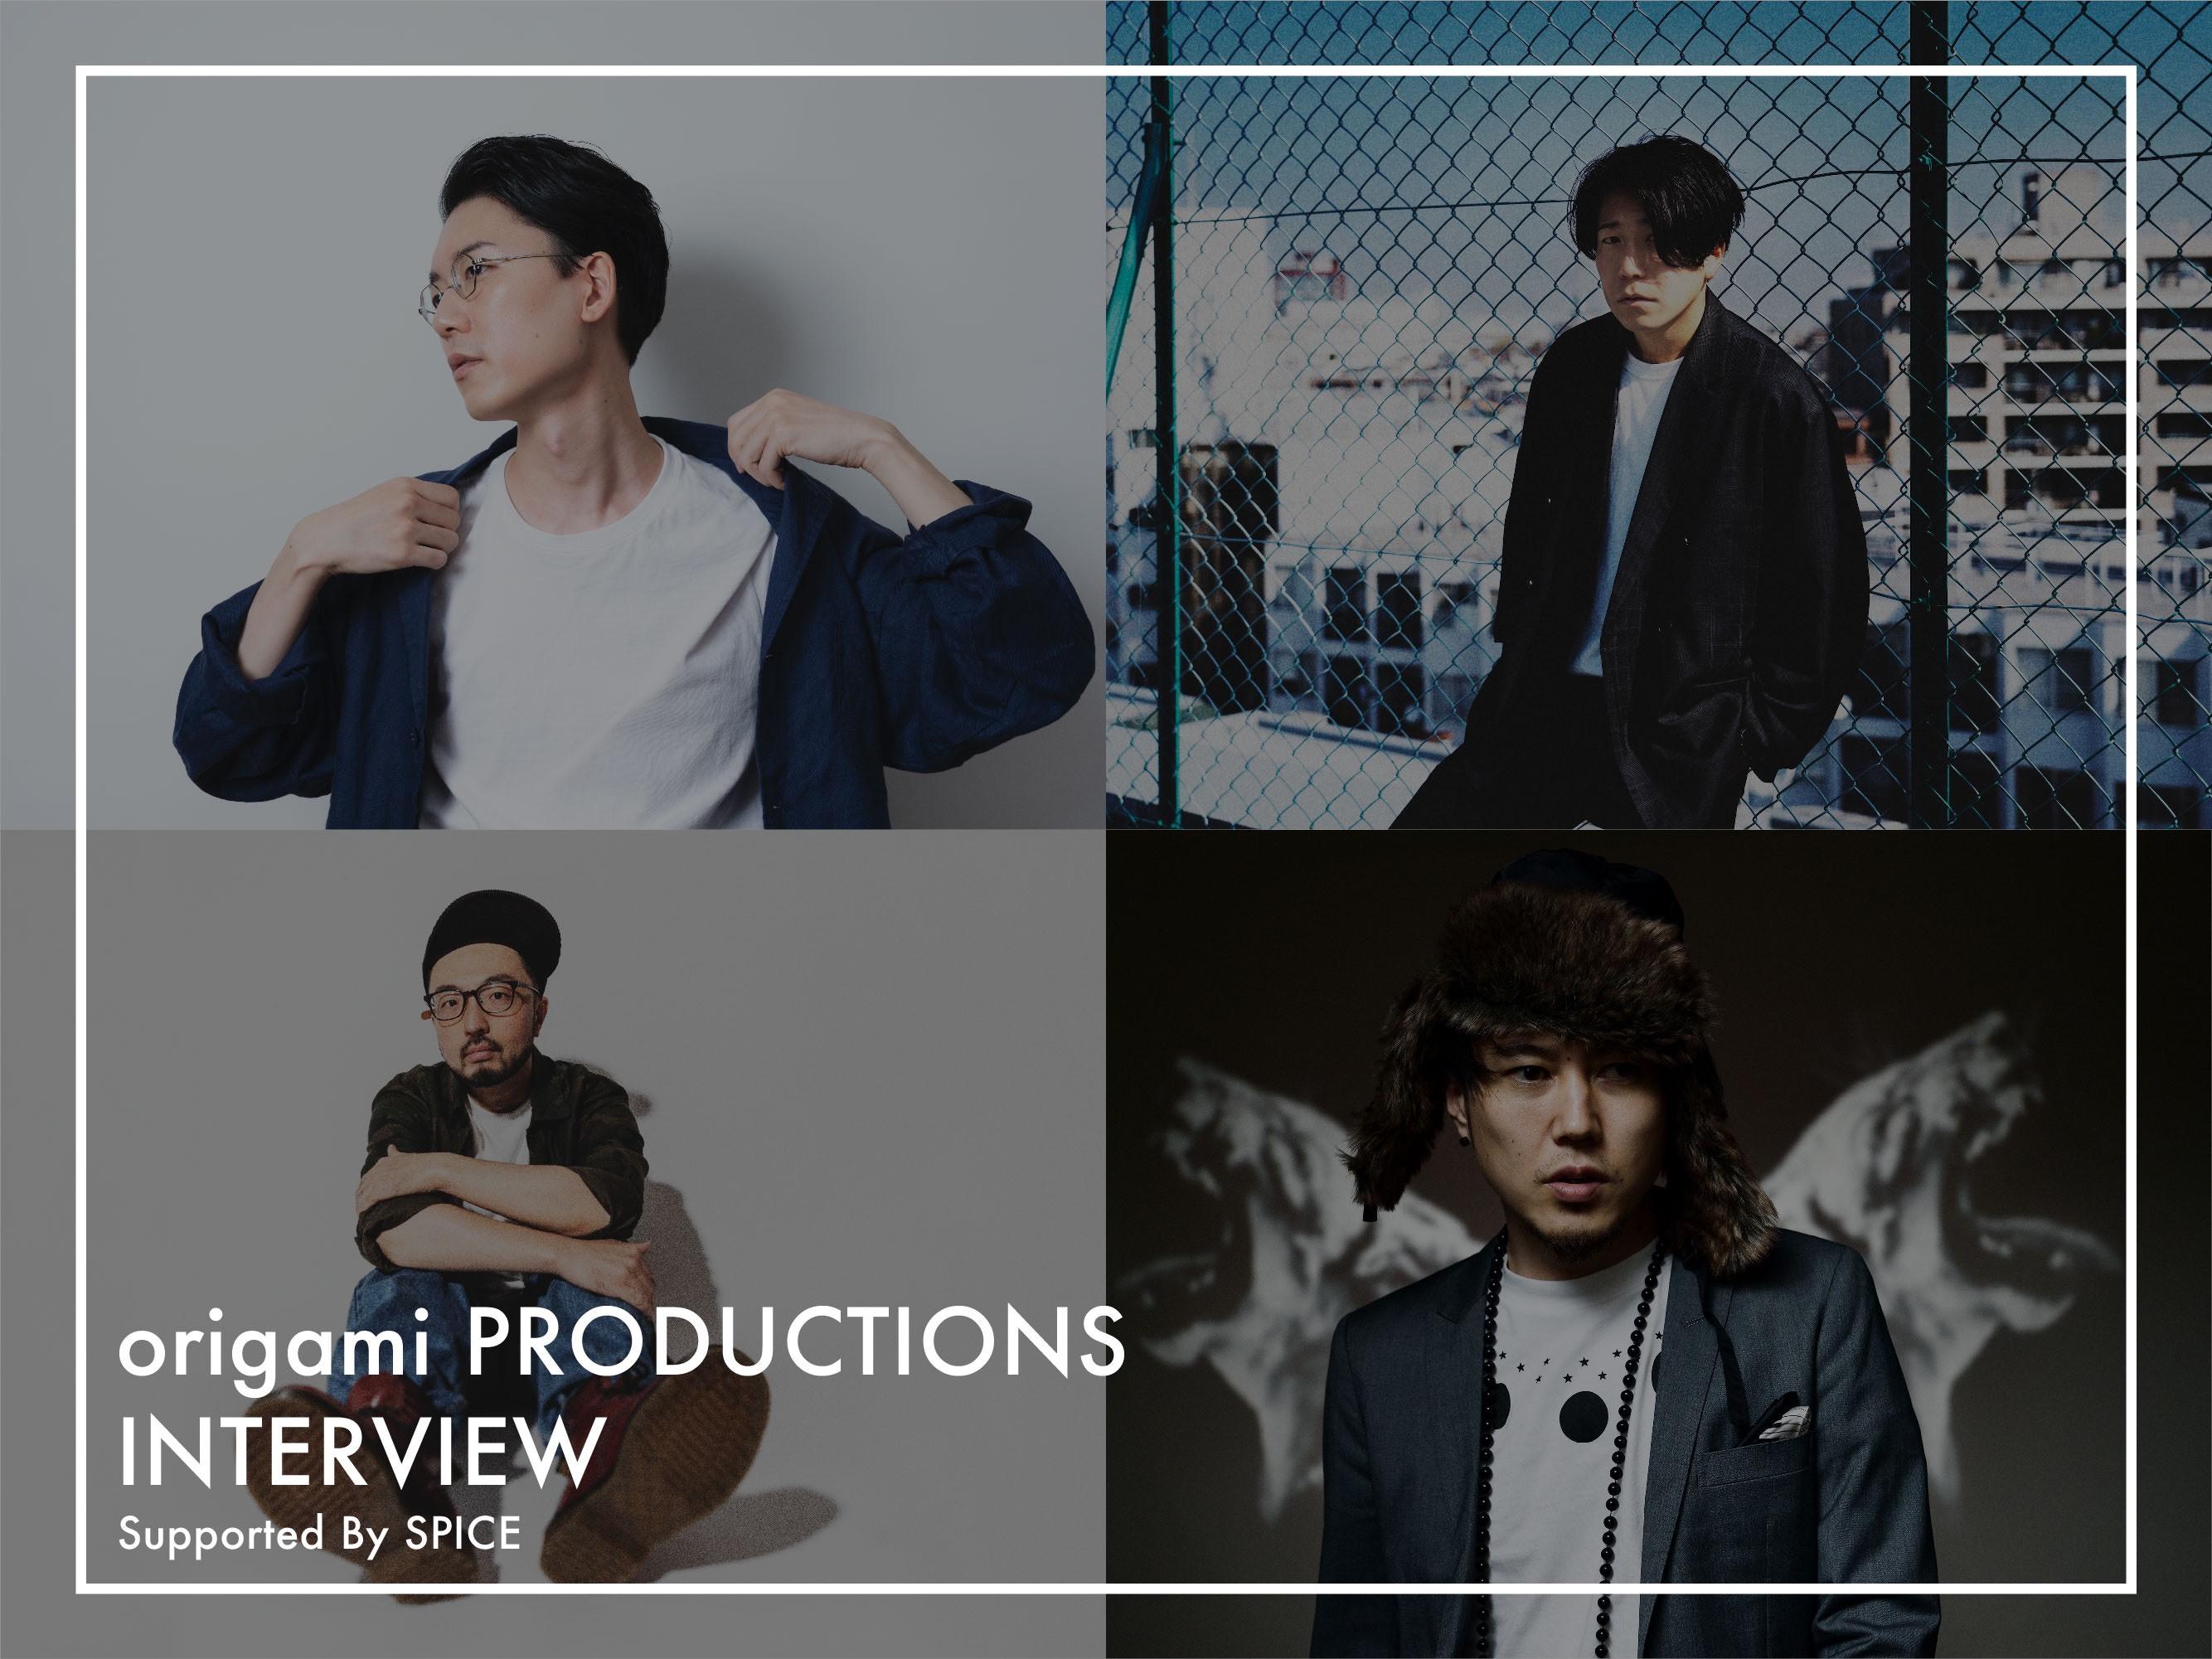 origami PRODUCTIONS(Shingo Suzuki(Ovall)、Kan Sano、Michael Kaneko、Hiro-a-key)